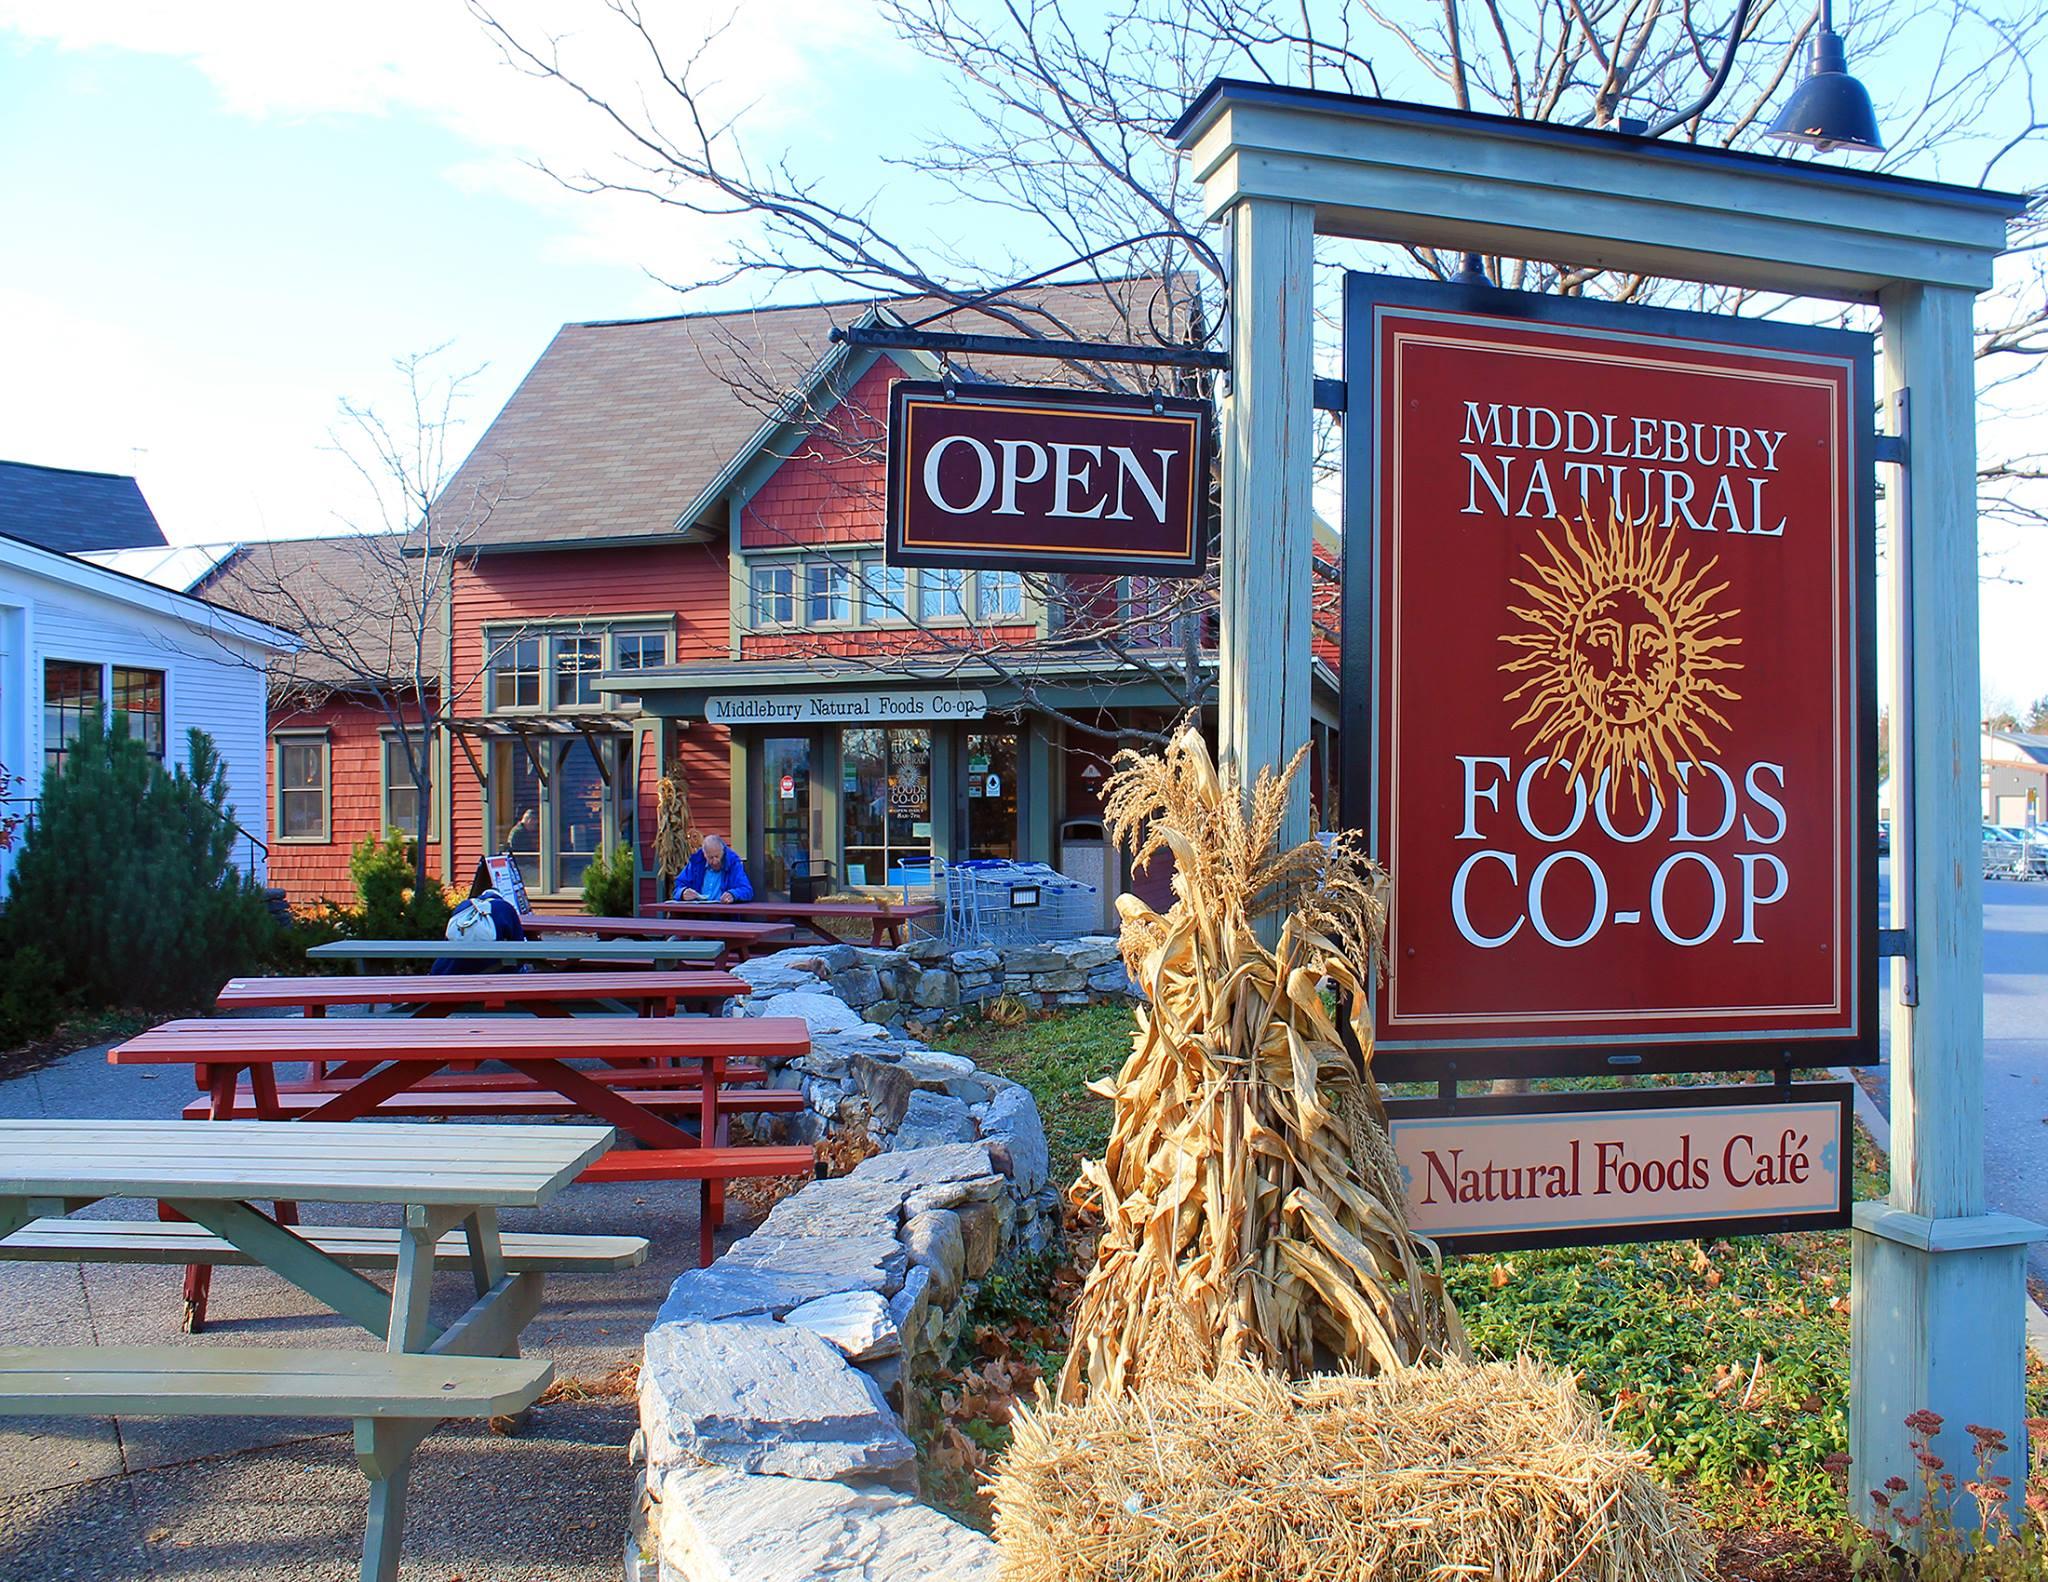 Middlebury Natural Food Coop